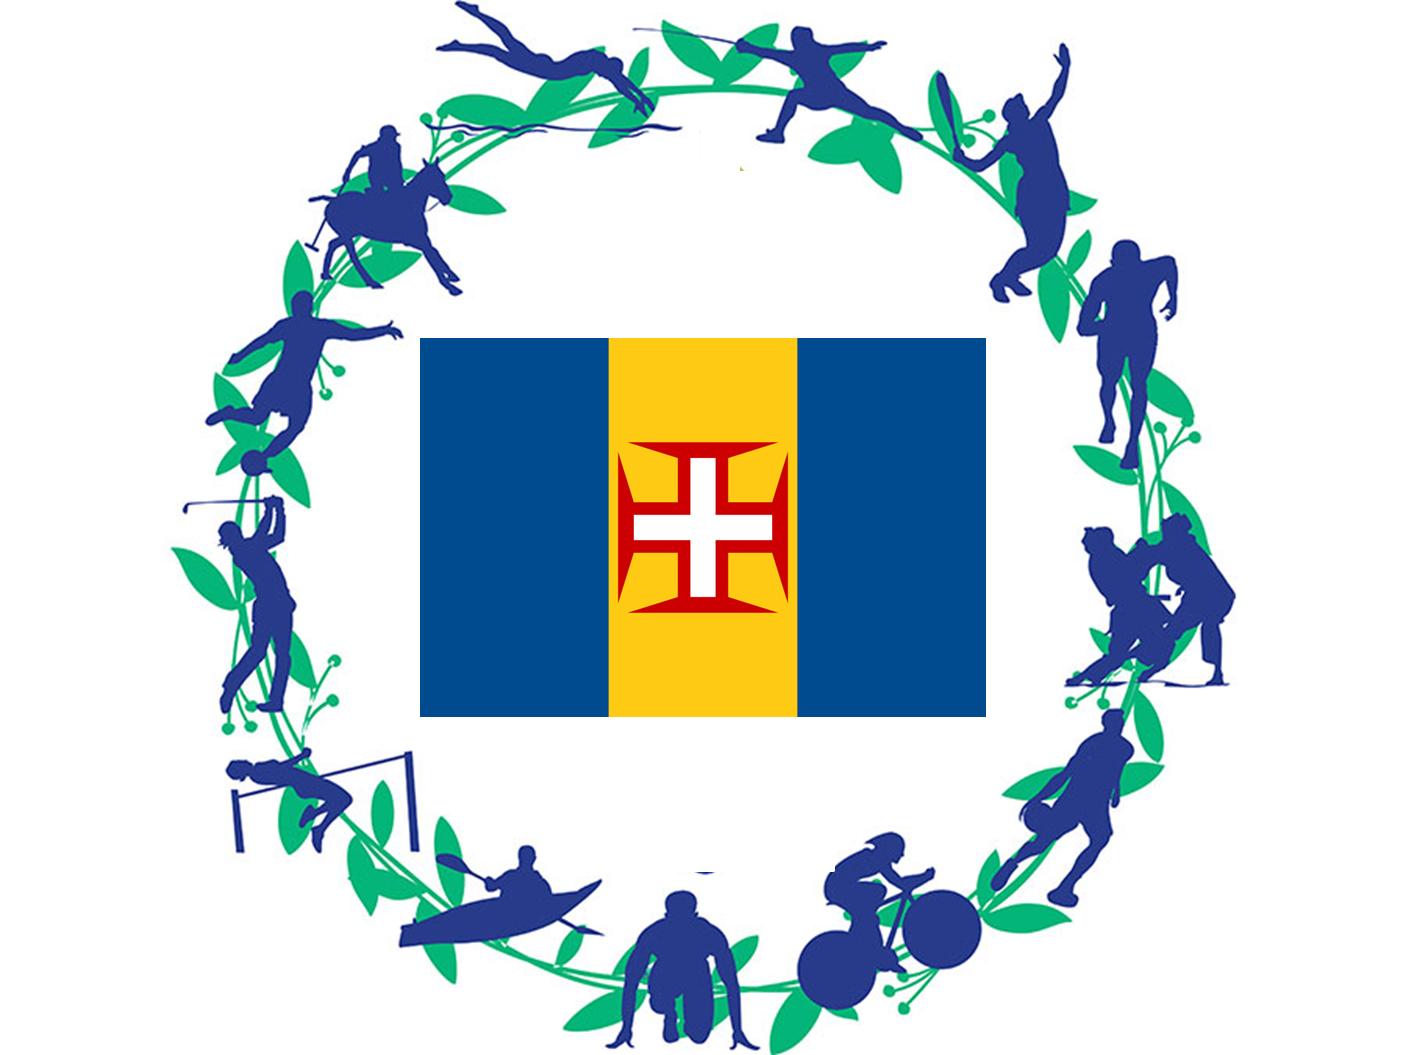 Plano Regional de Apoio ao Desporto 2020/2021